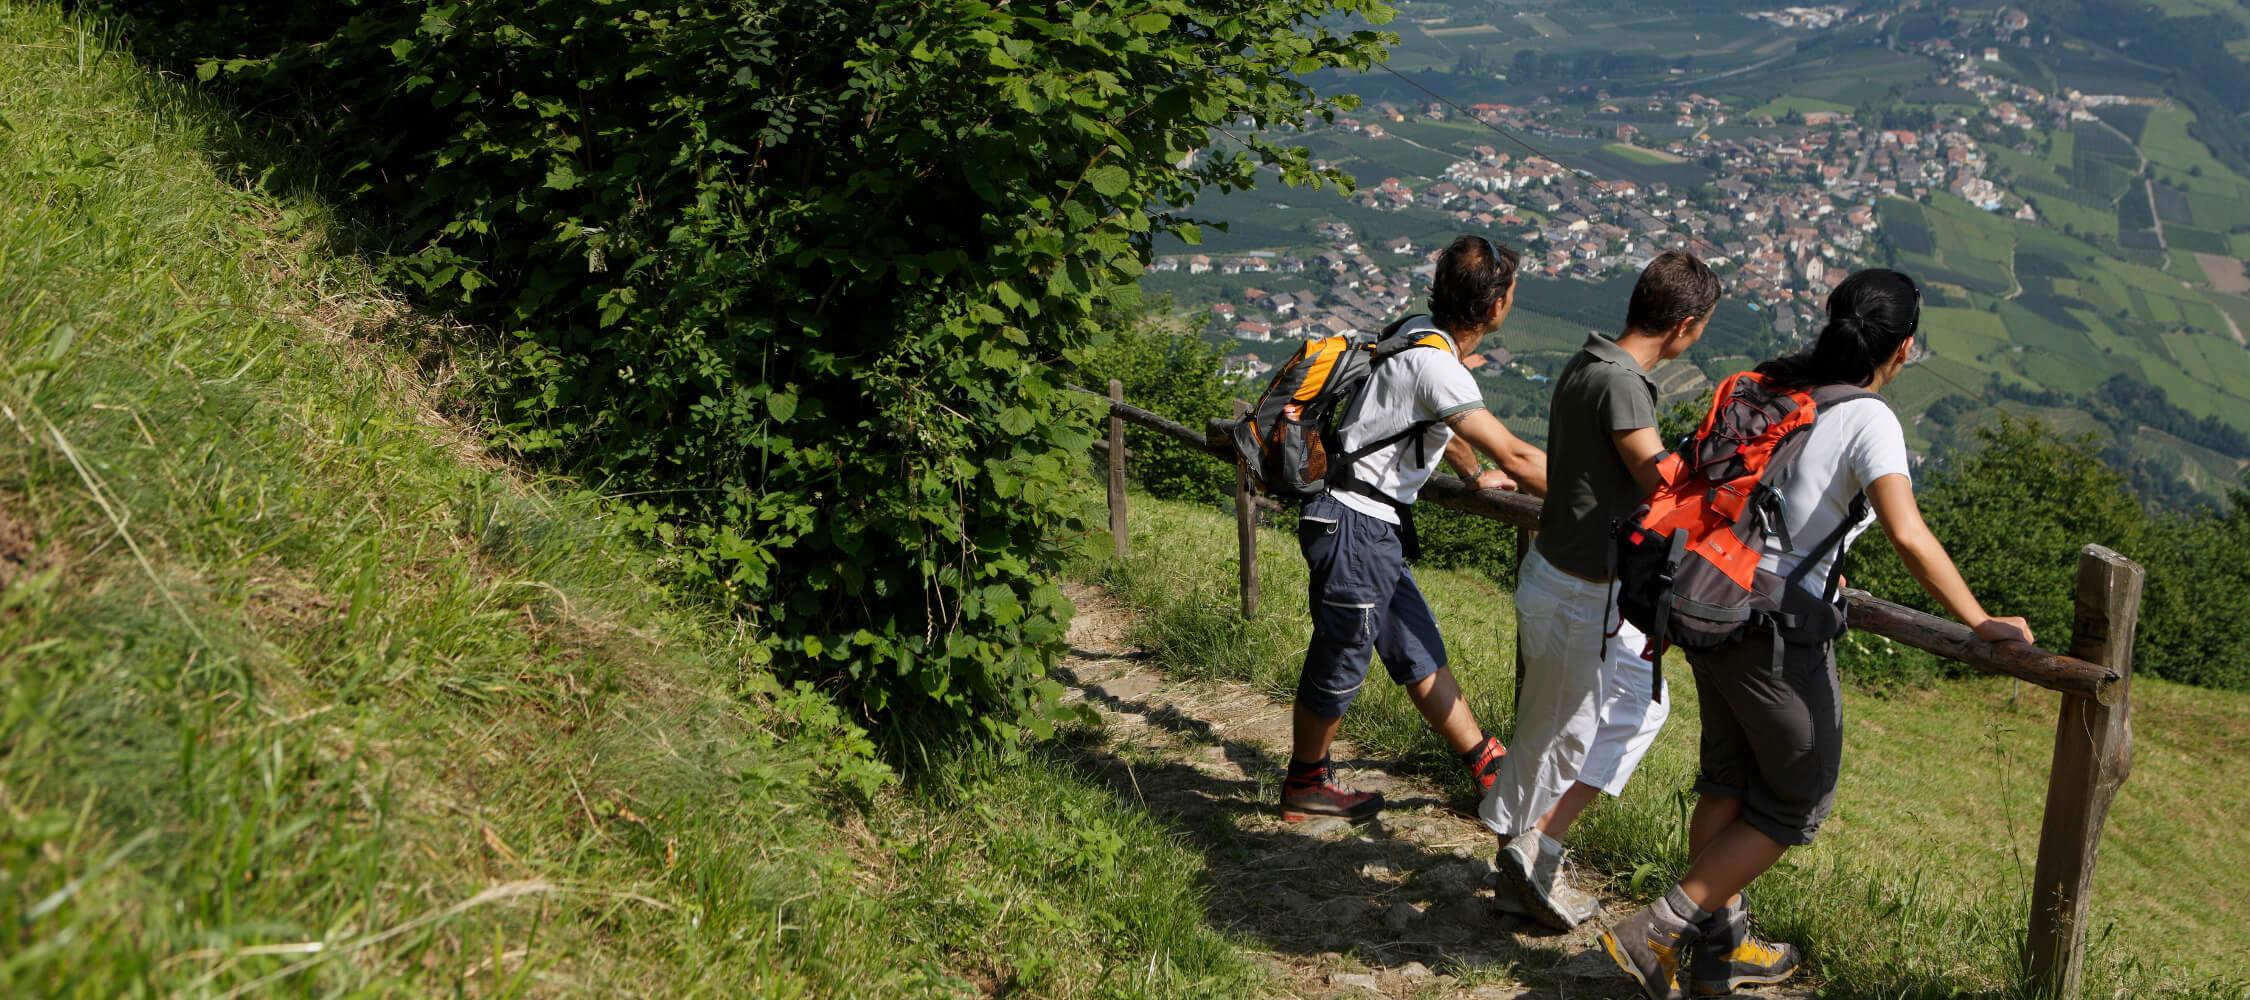 Italien-Trentino_Suedtirol_Alto_Adige_Merano_Meran_Natur_Sport_Sommer_Wandern_Berg_Hoehenweg_MGM-Frieder-Blickle_mgm00222frbl_2250x1000